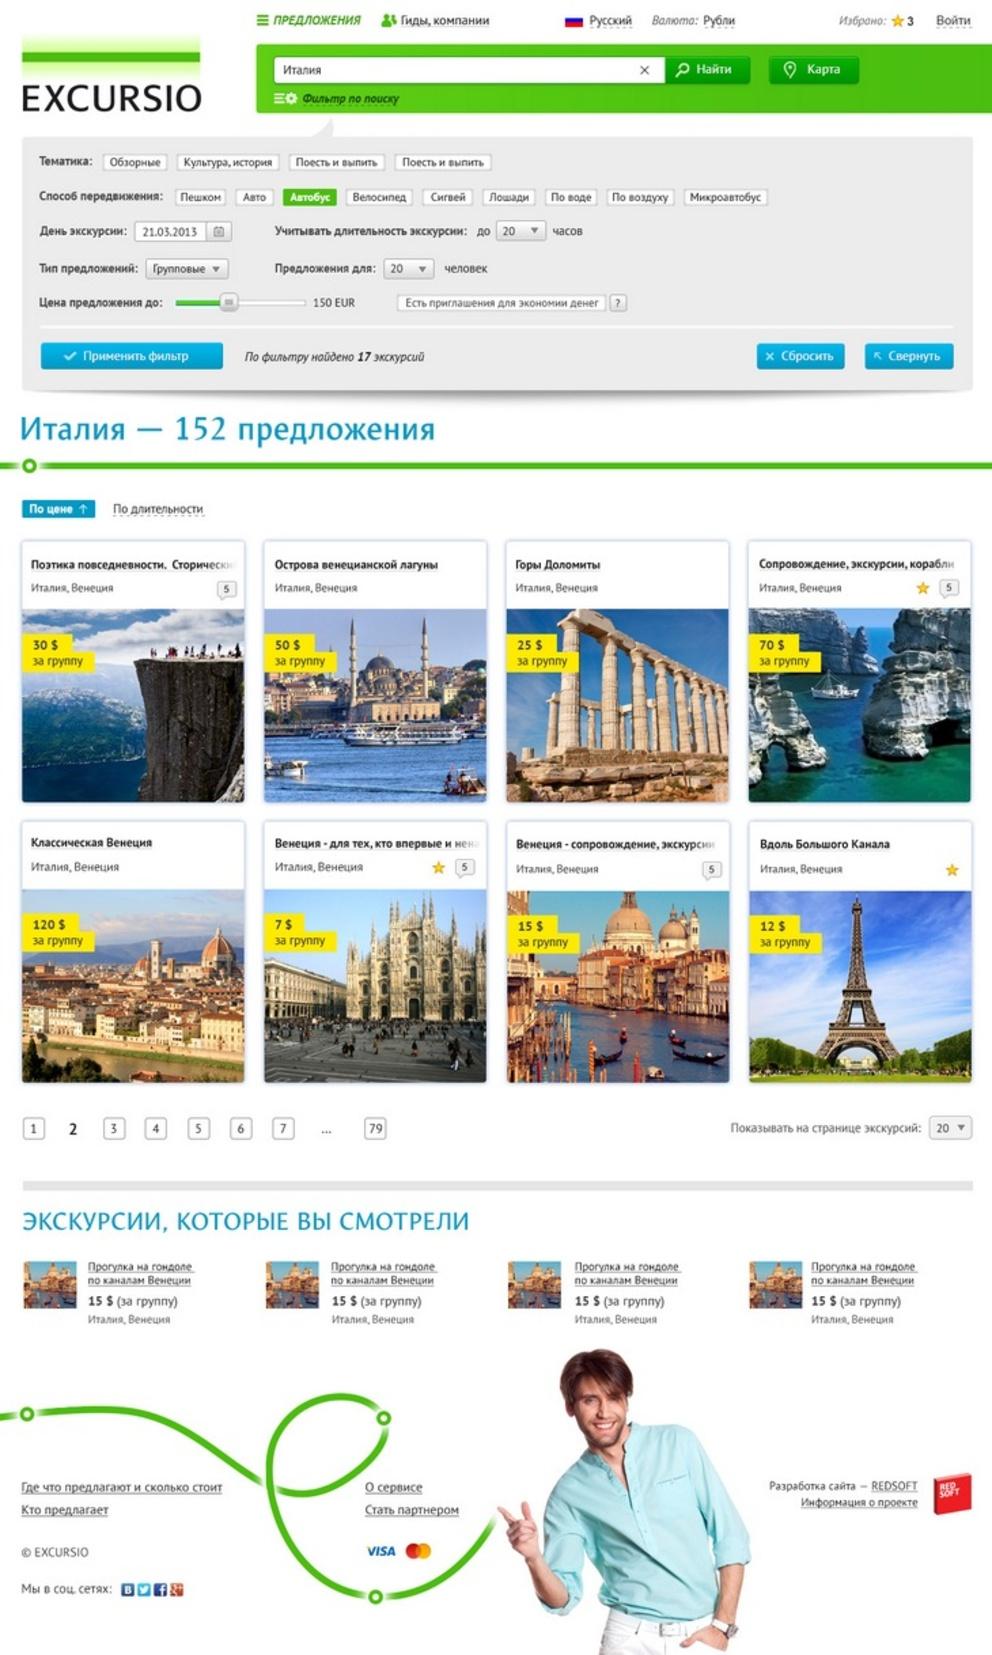 Excursio.com / Проект компании Redsoft